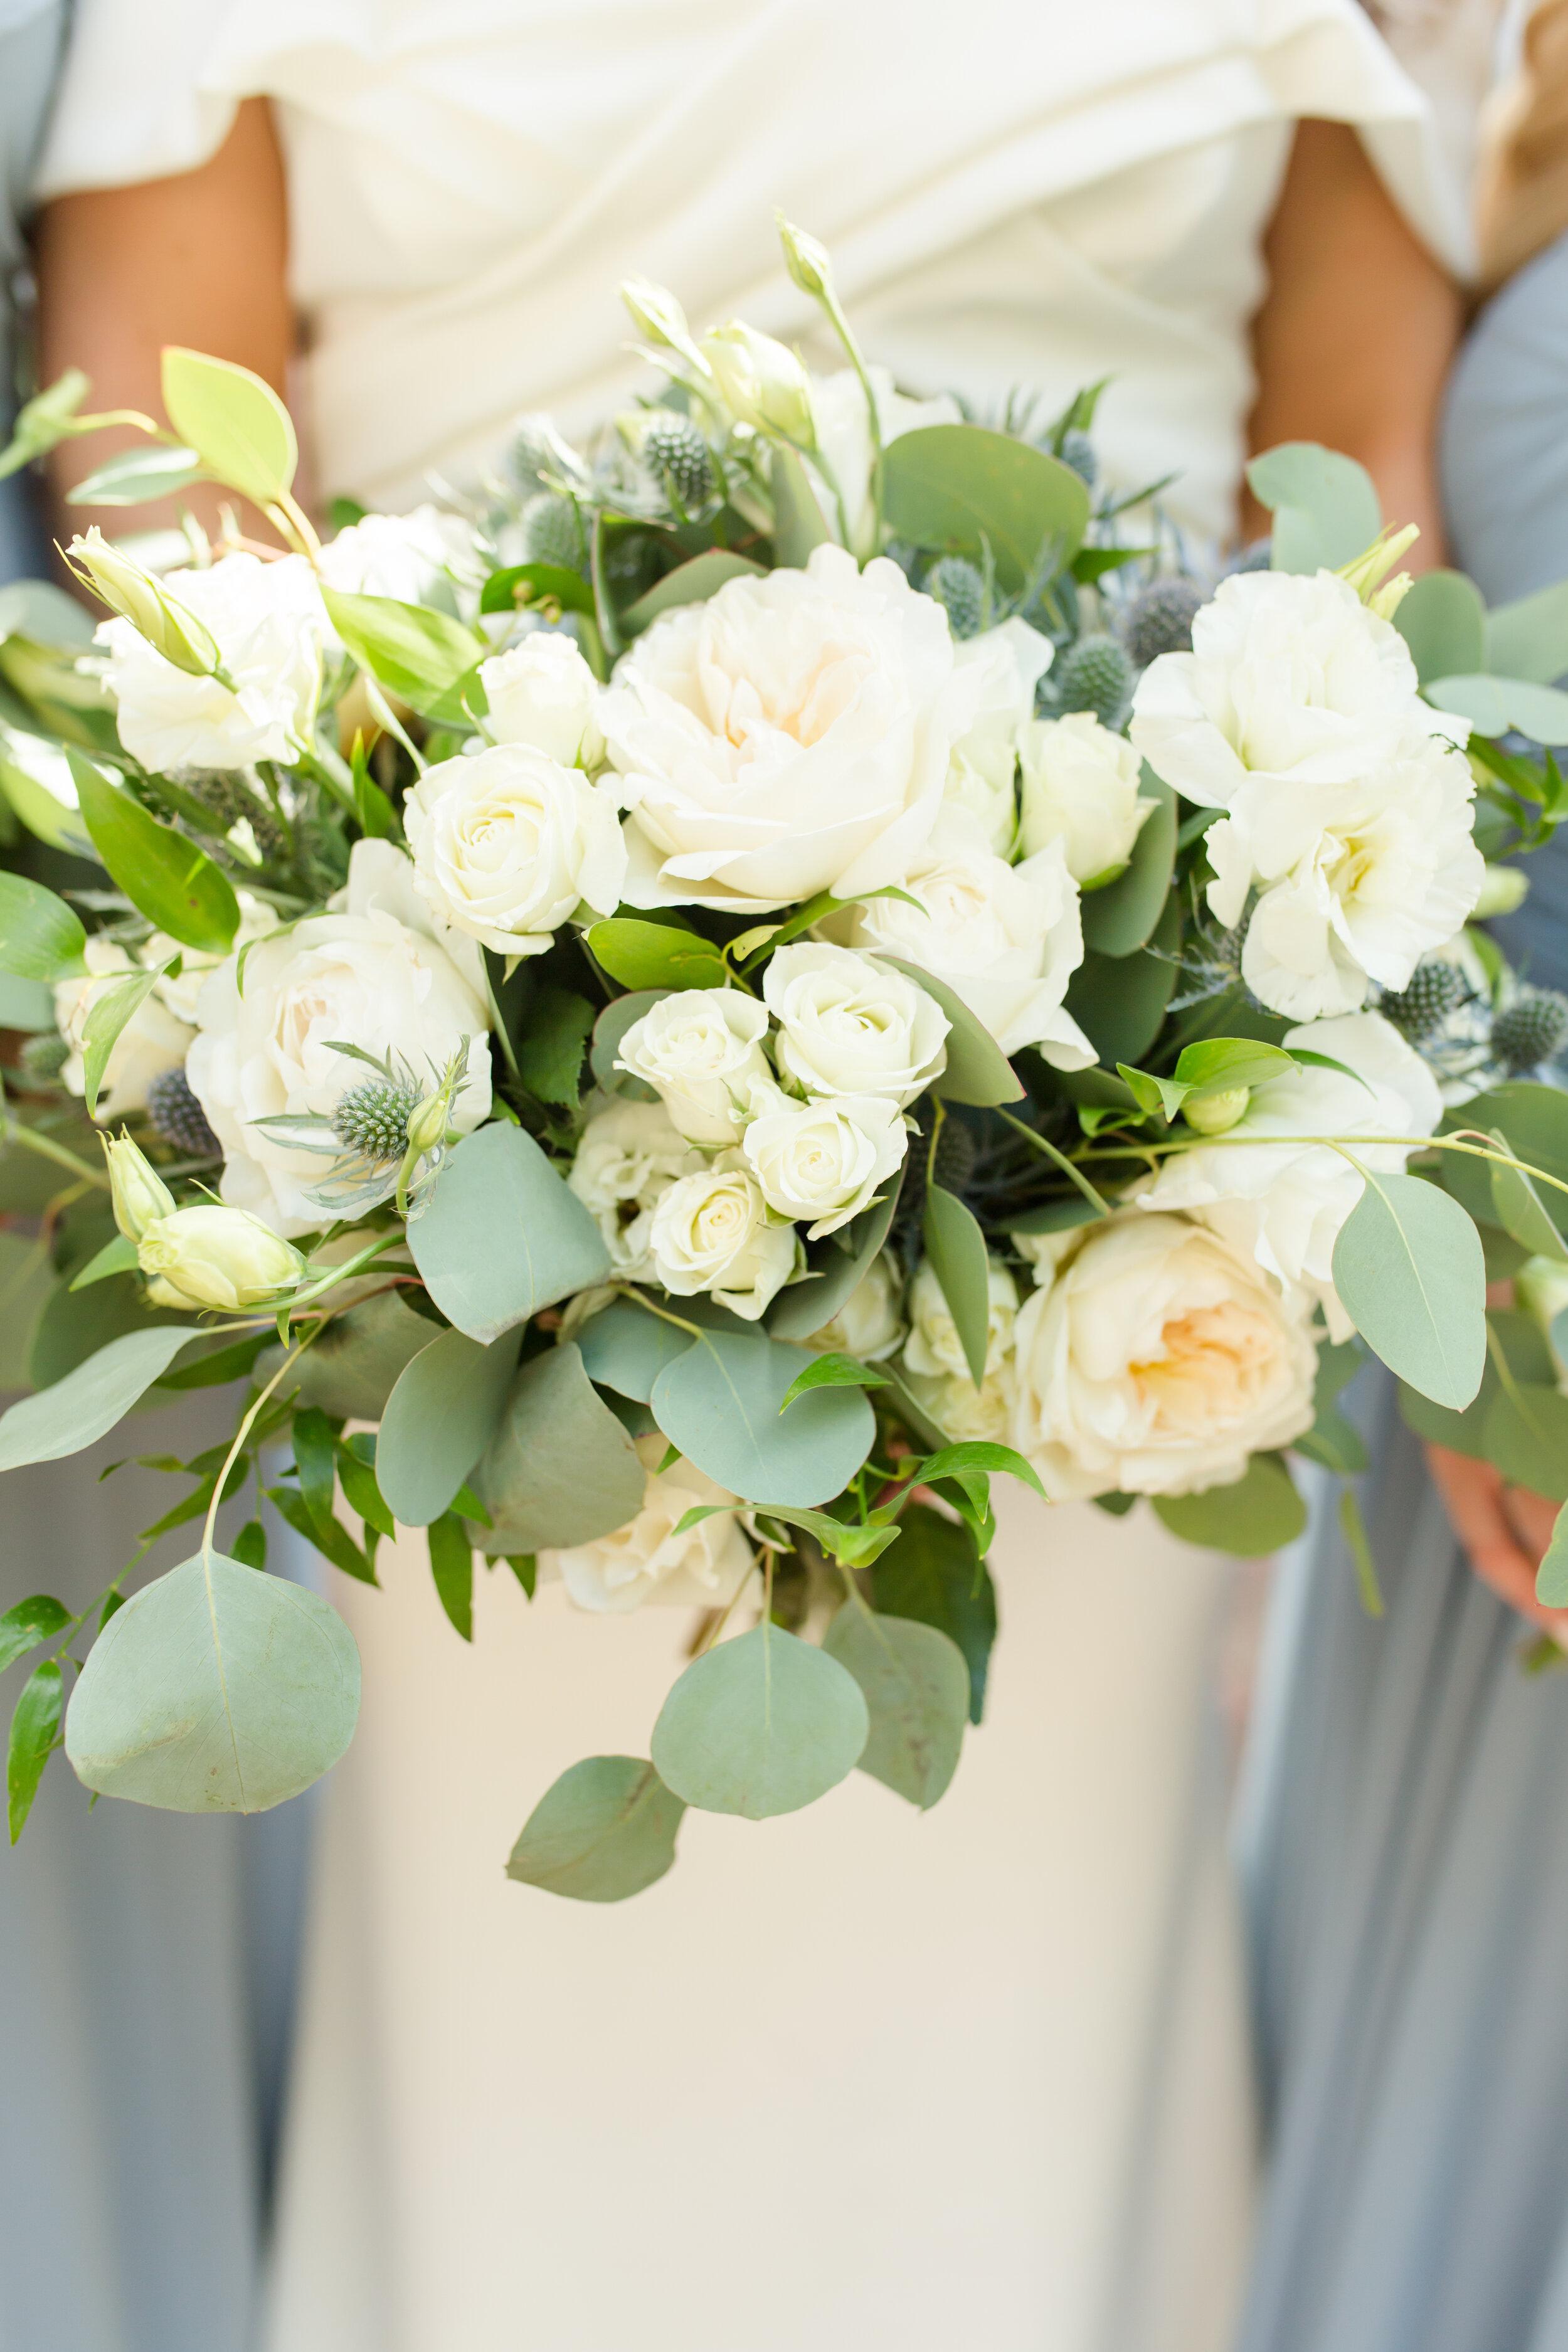 ivory-and-beau-bride-wedding-dresses-bridal-boutique-bridal-shop-savannah-wedding-shop-DGP_SohoSouthCafe_Swanagin-Mullis-155.JPG